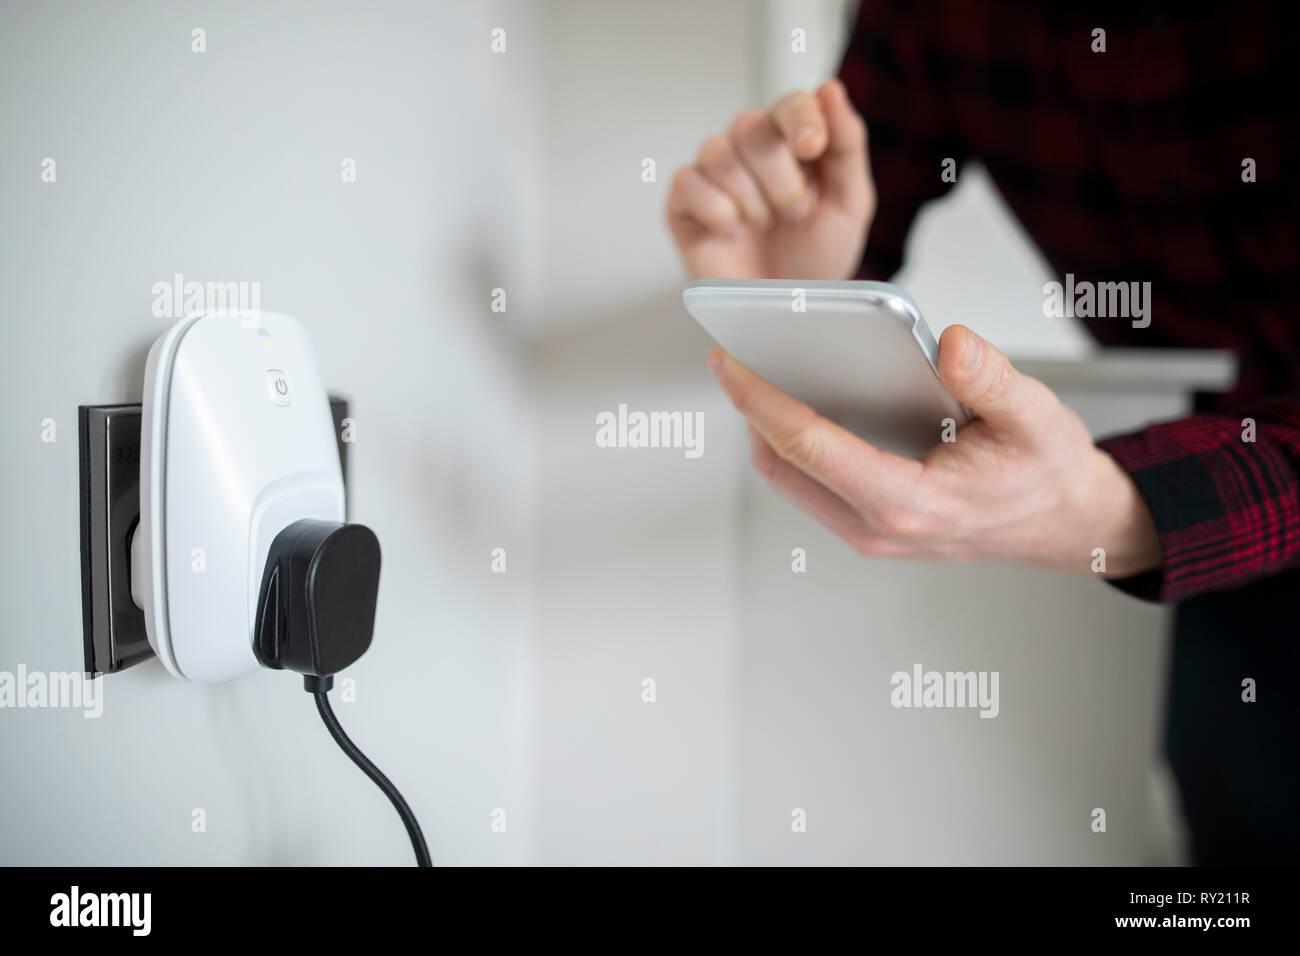 Man Controlling Smart Plug Using App On Mobile Phone Stock Photo